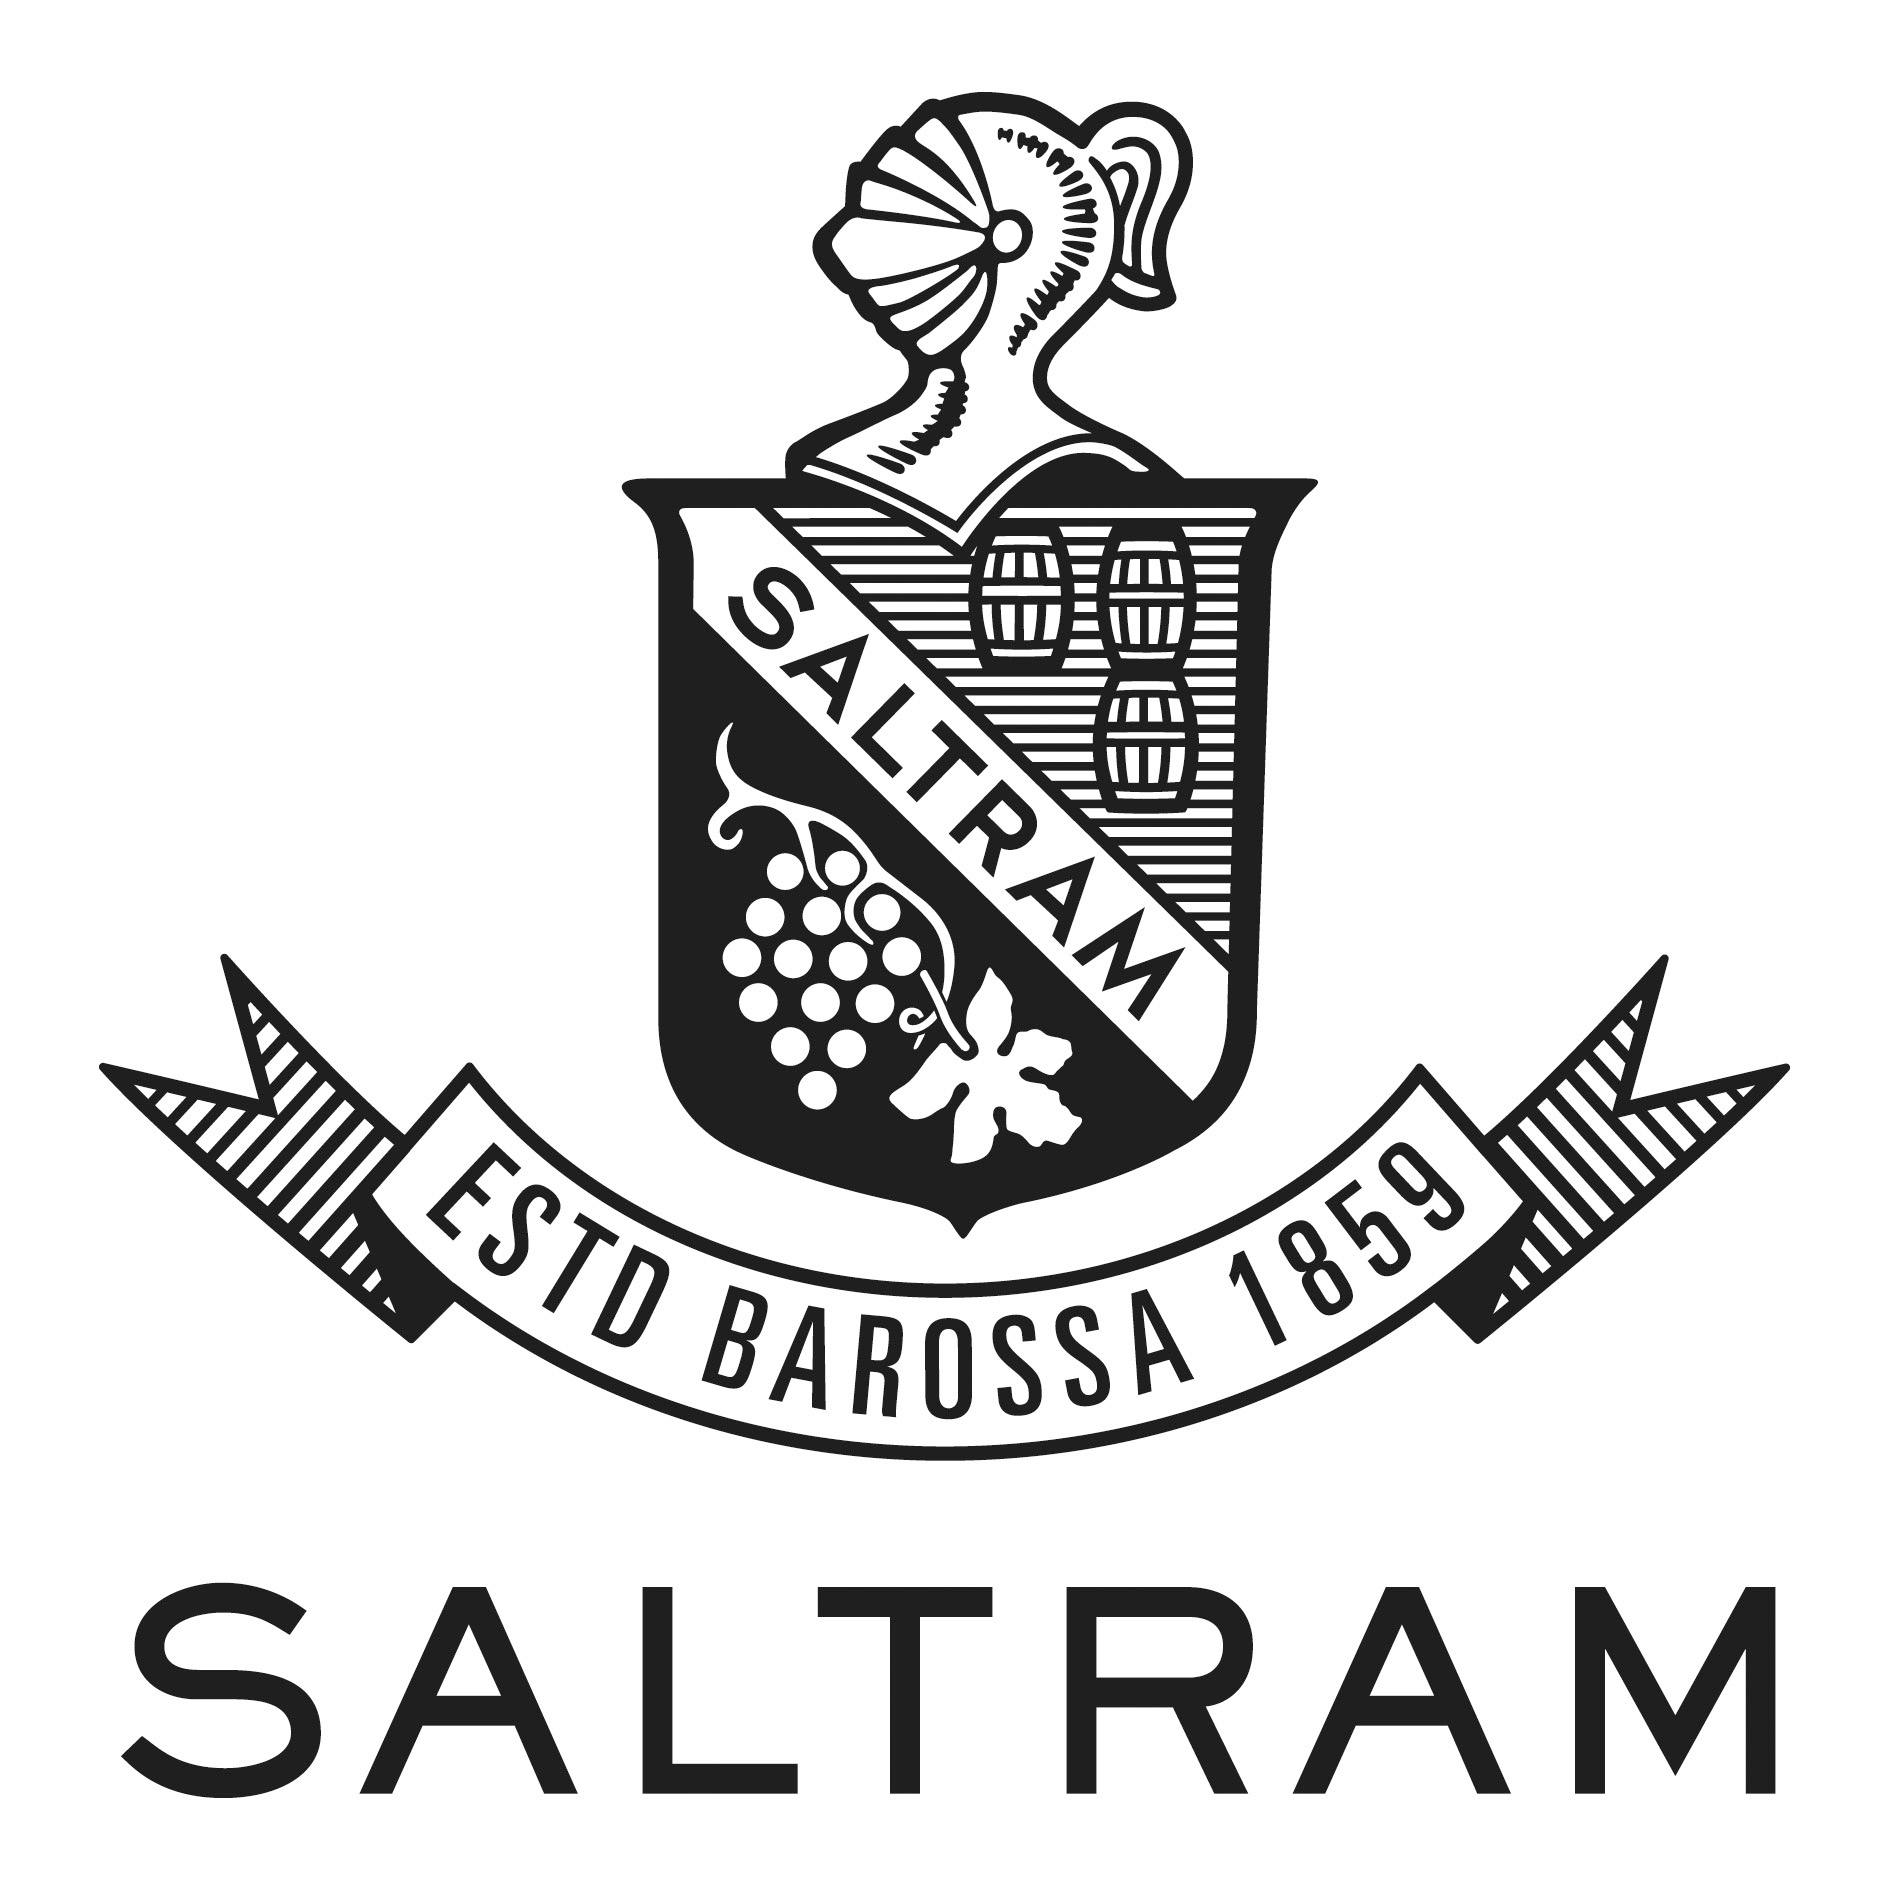 【TWE 酒展攻略】巴羅沙谷地的開墾元老:澳洲史創酒廠 SALTRAM